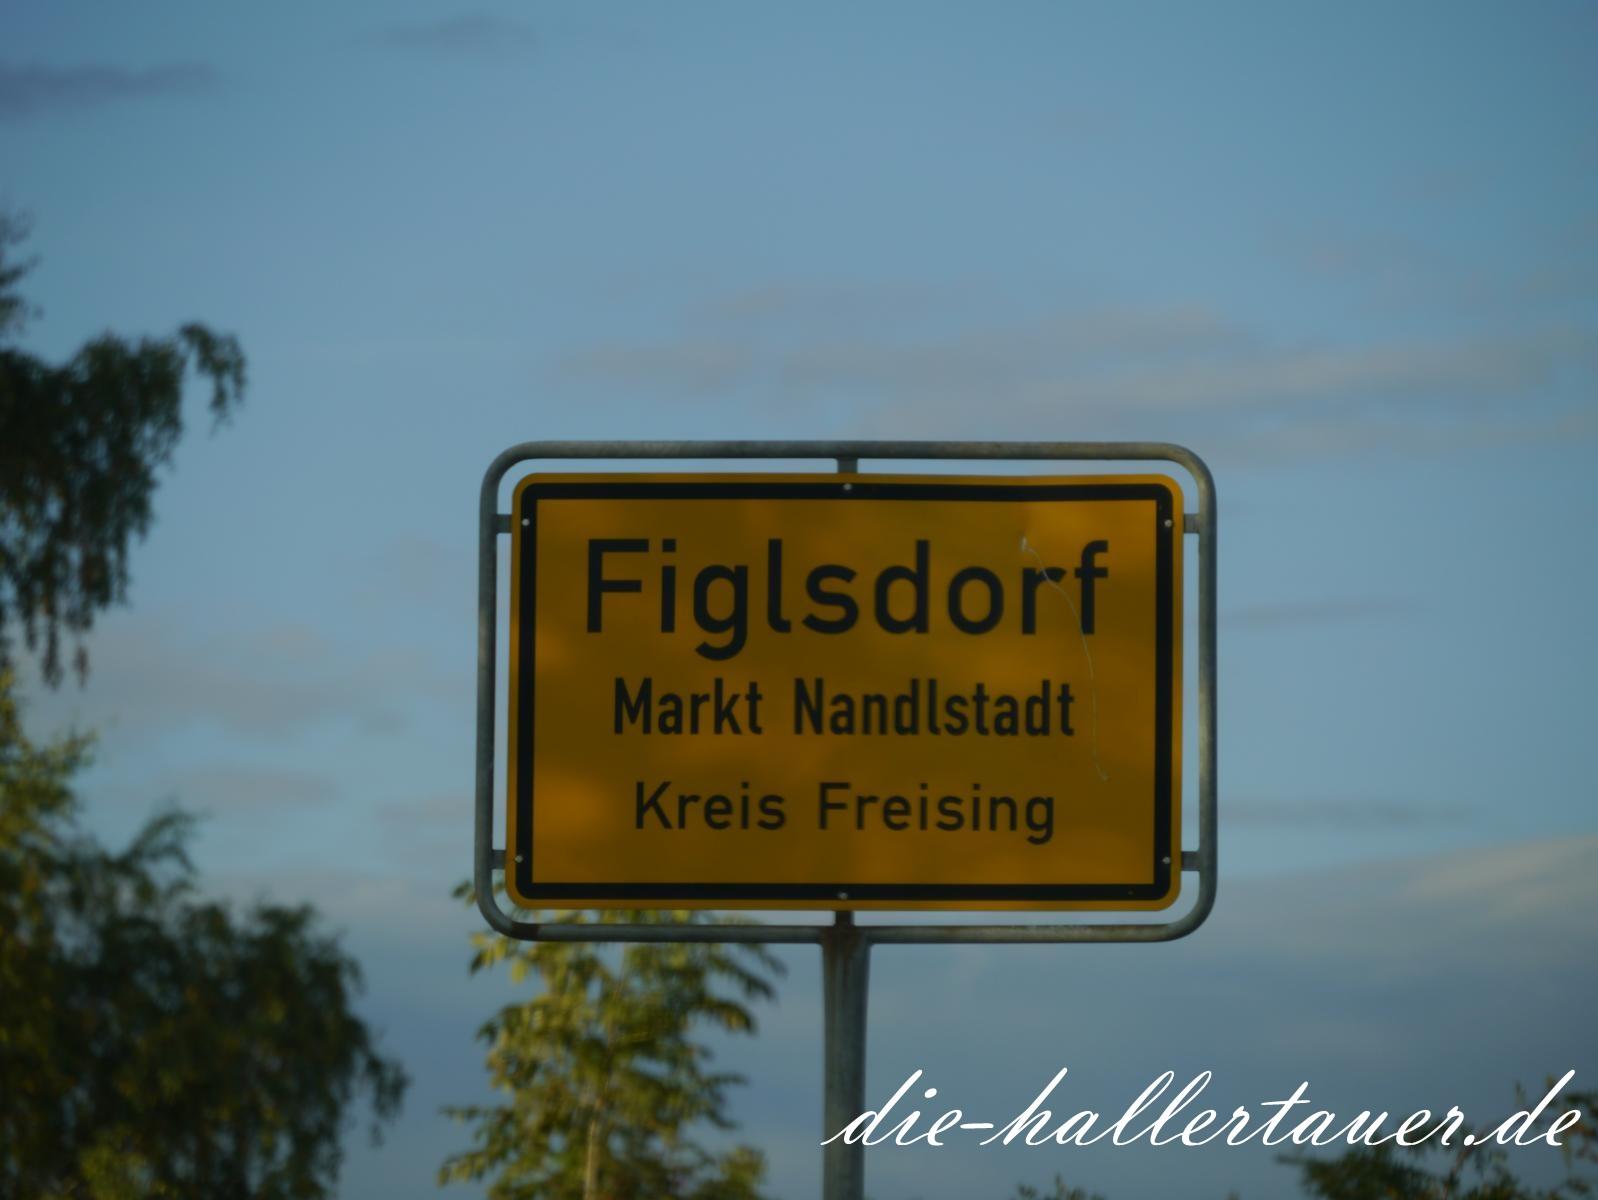 Figlsdorf